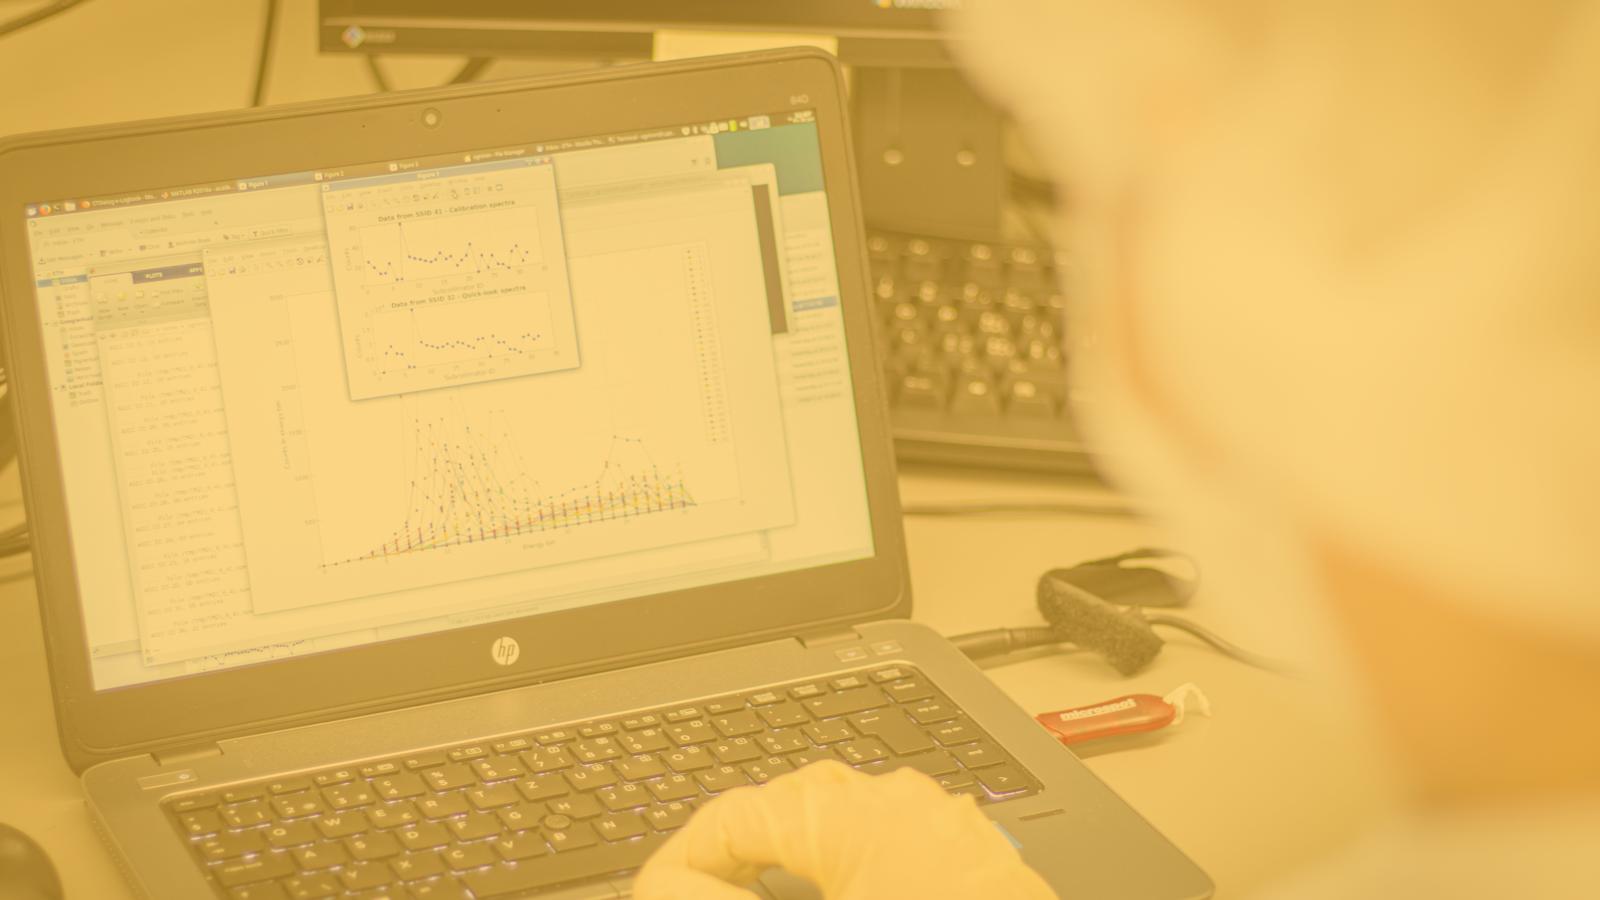 STIX FSW Maintenance and Data Processing (duplex)